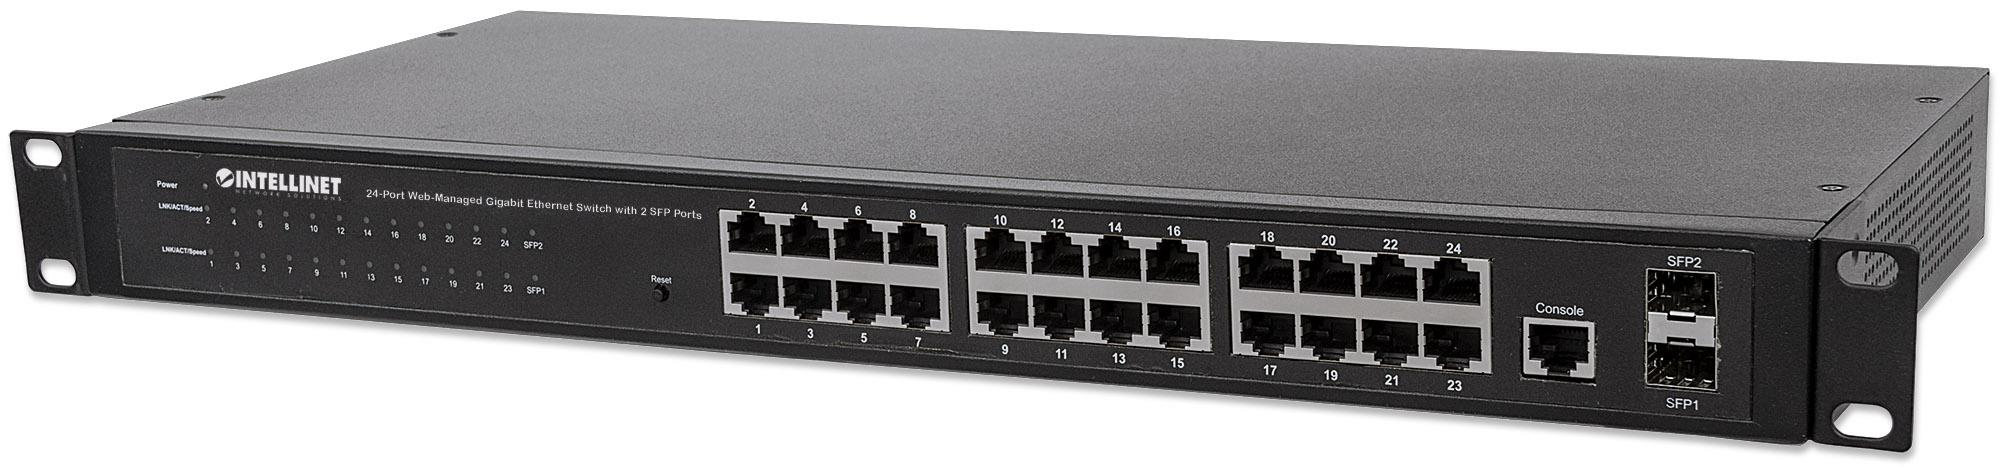 24-Port Web-Managed Gigabit Ethernet Switch with 2 SFP Ports